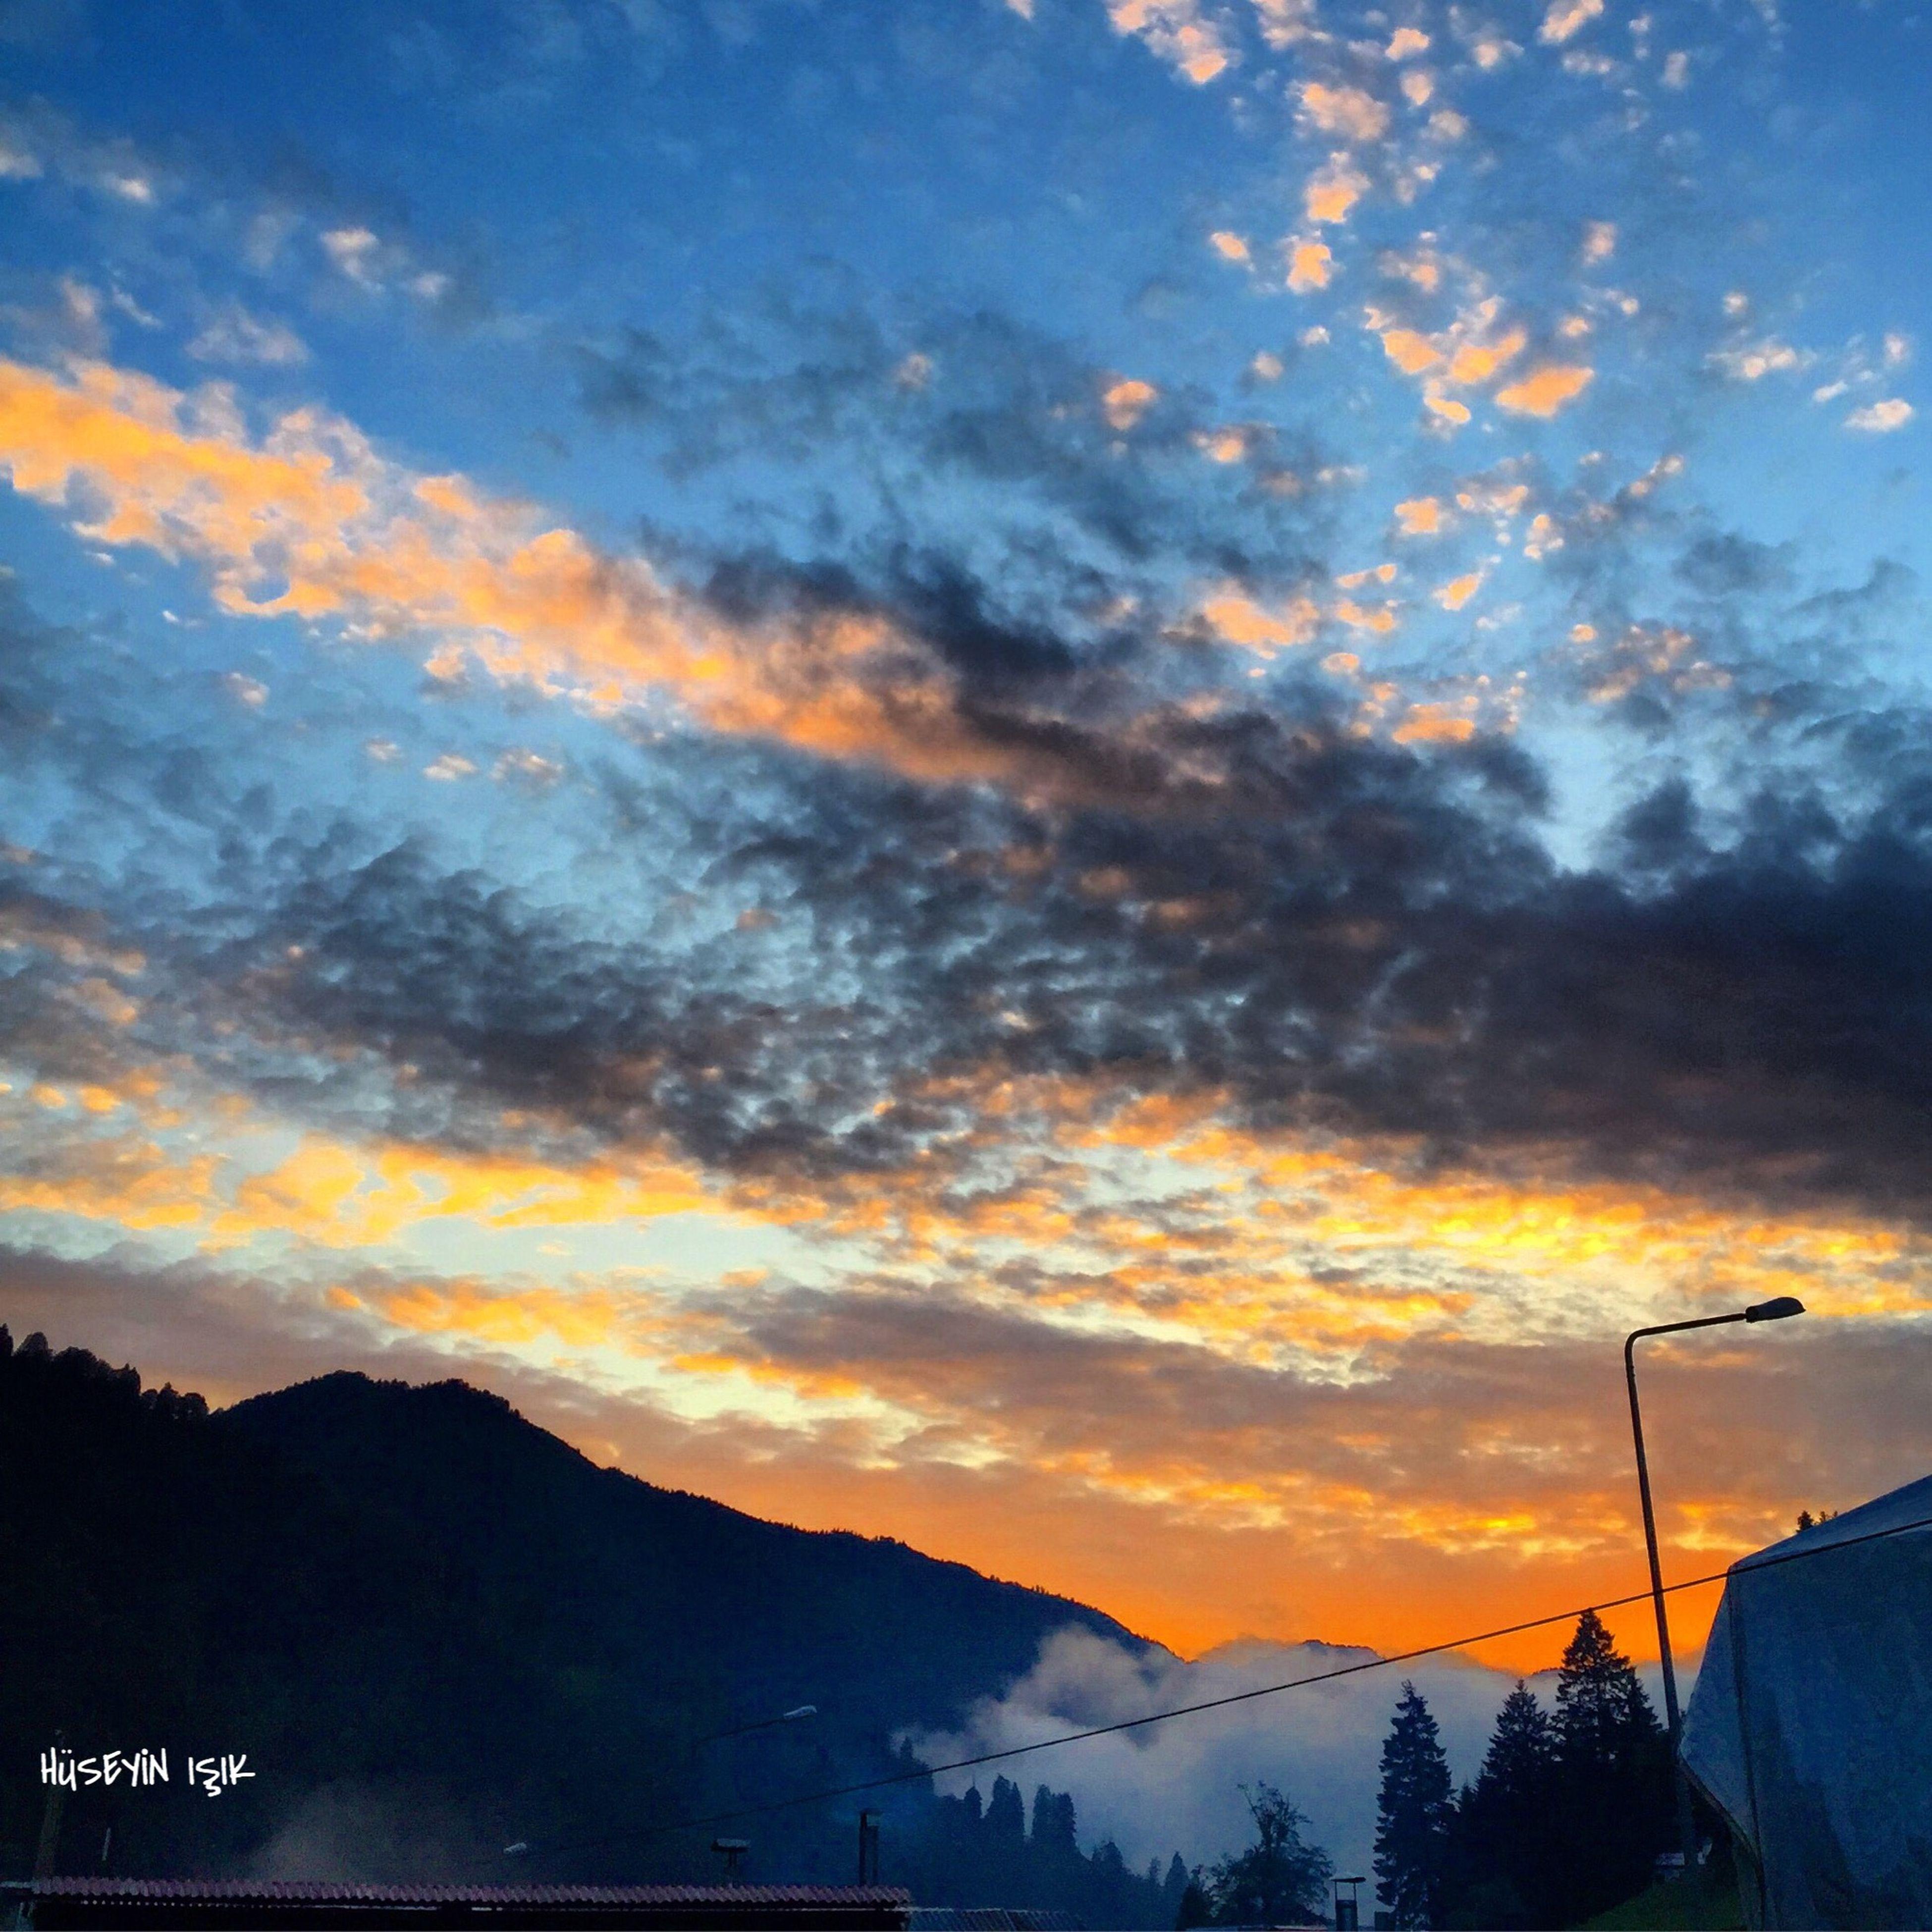 sunset, sky, scenics, beauty in nature, tranquil scene, mountain, tranquility, cloud - sky, silhouette, orange color, nature, landscape, cloud, idyllic, dramatic sky, mountain range, cloudy, non-urban scene, weather, dusk